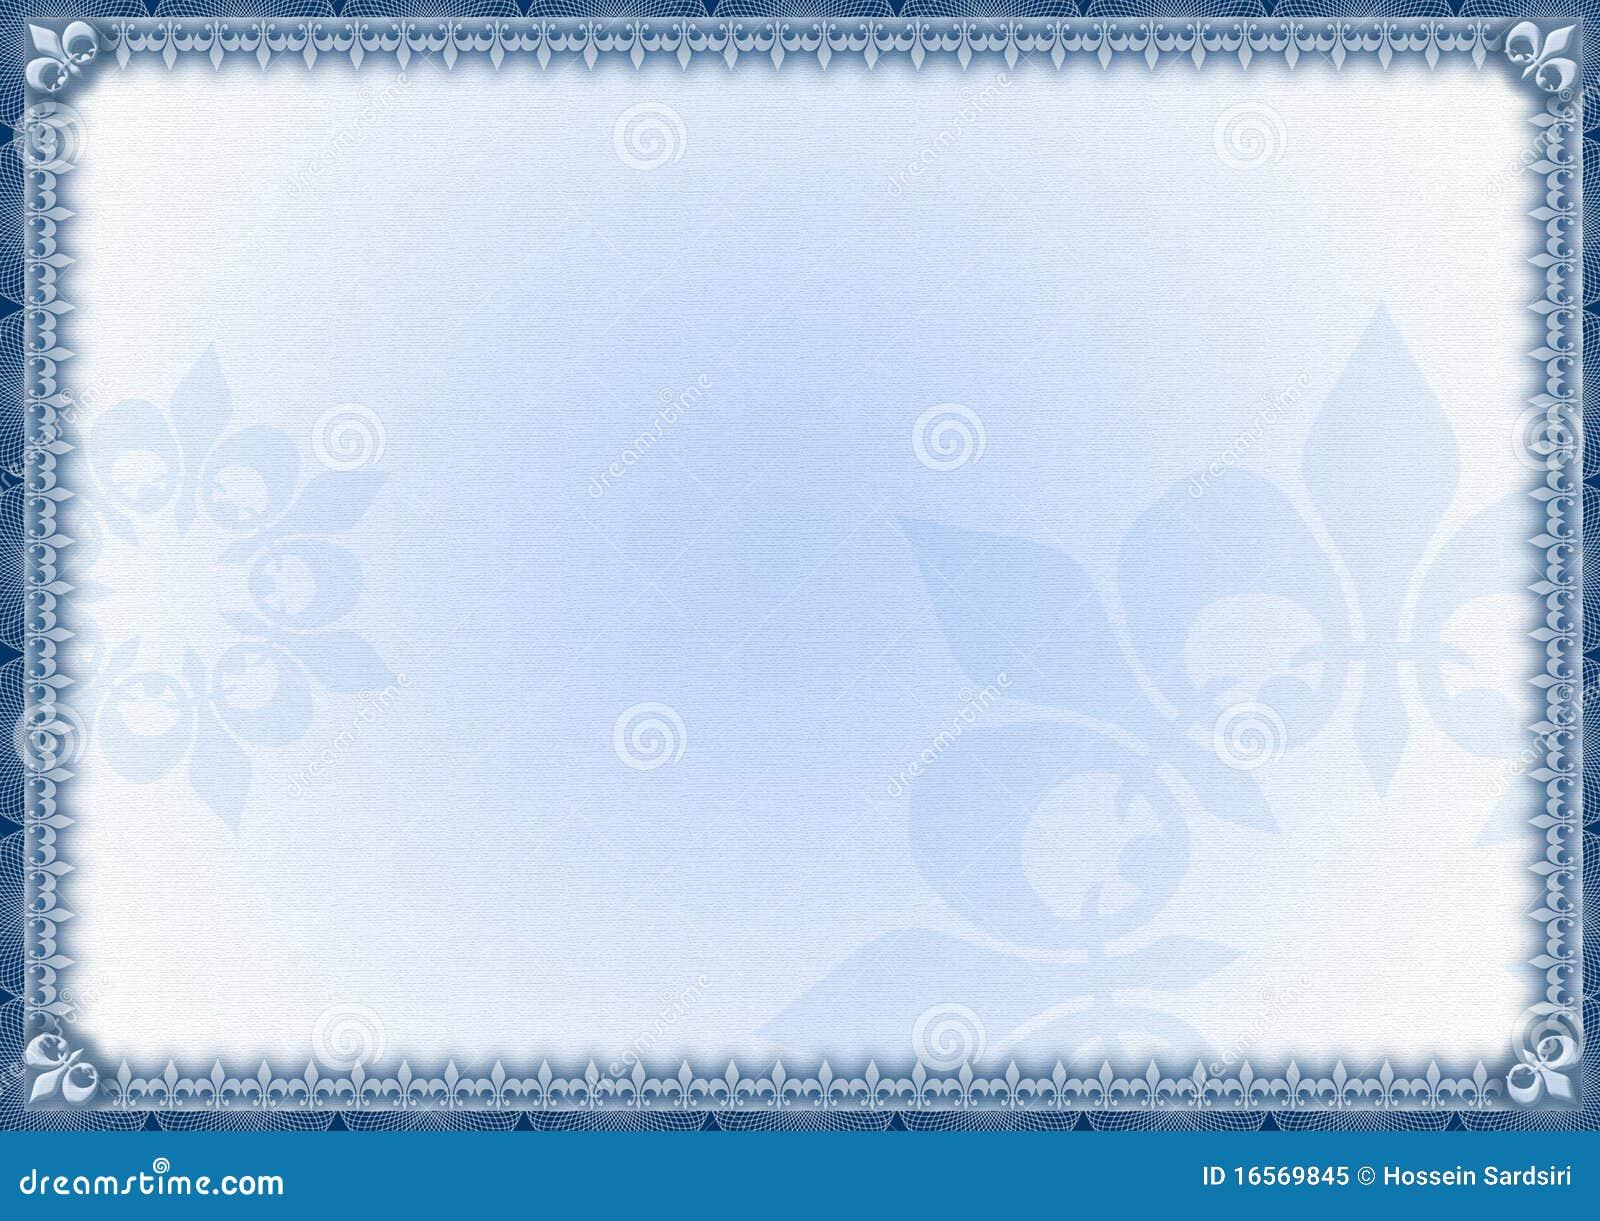 Elegant Blue Certificate Border